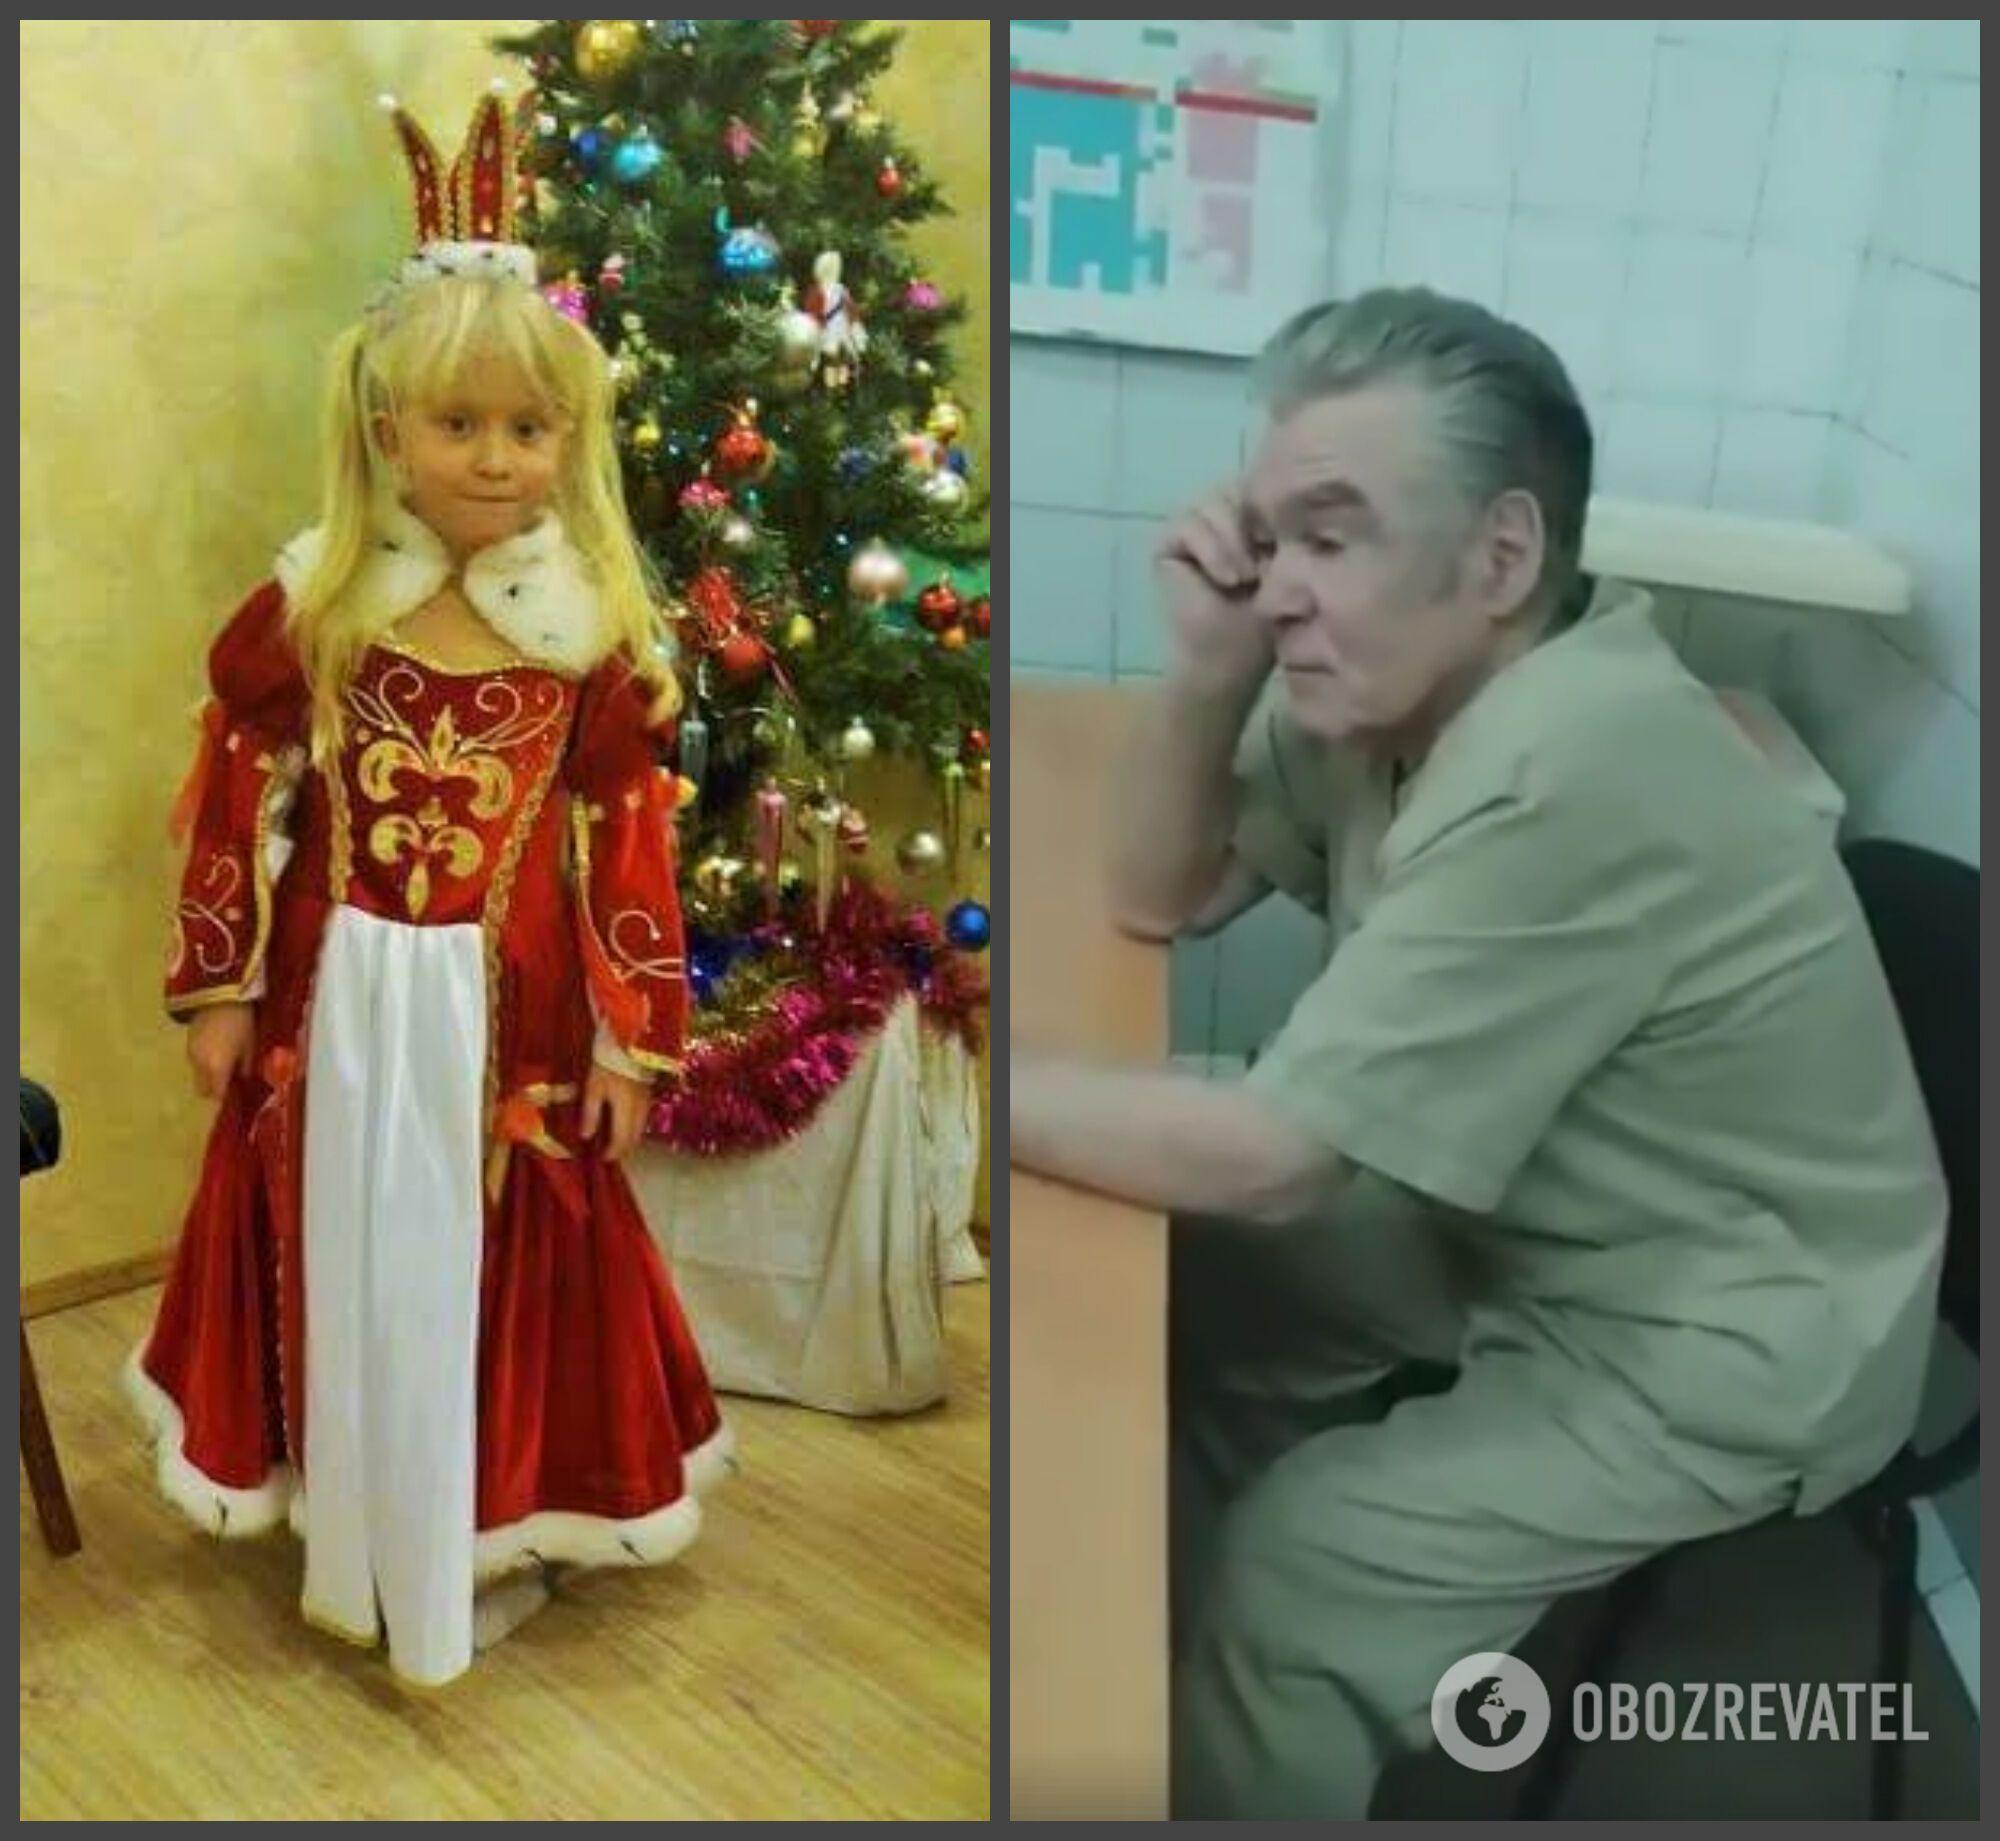 7-летняя Анастасия и 78-летний хирург